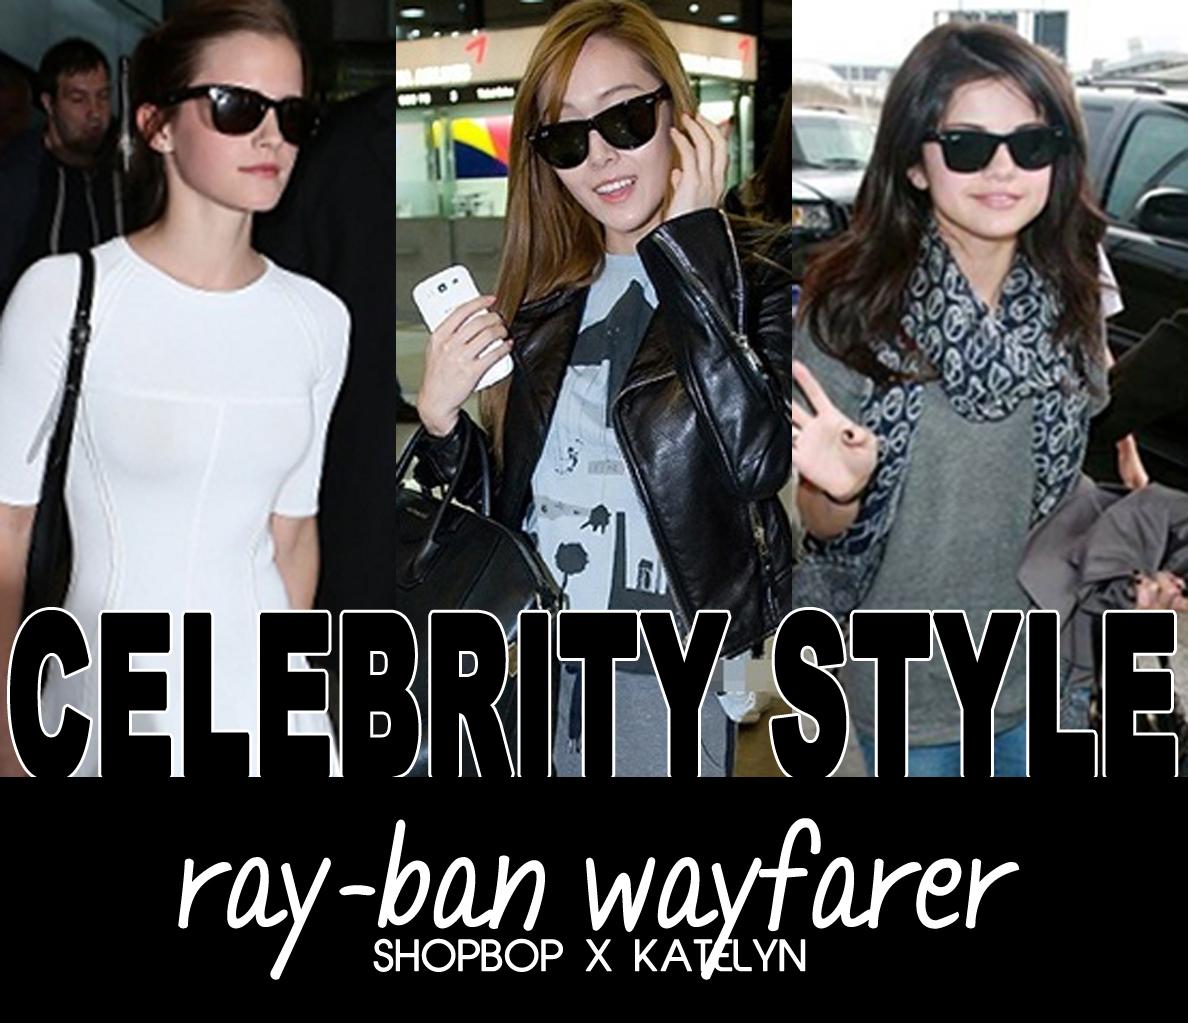 ray ban wayfarer sunglasses singapore  celebrity style: ray ban wayfarer. sunday, 26 october 2014